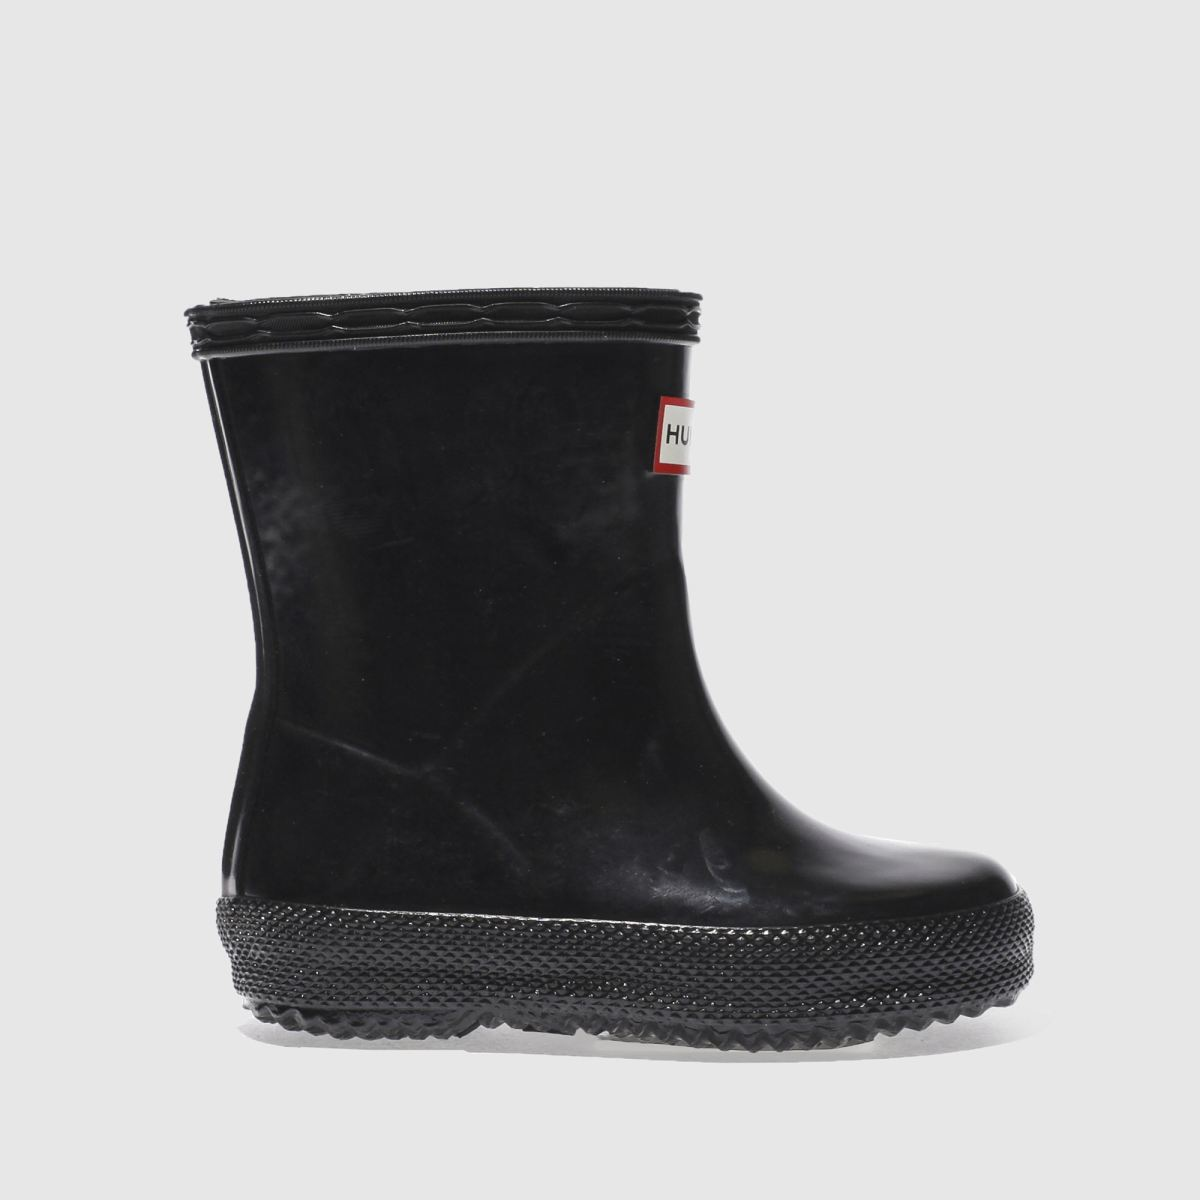 Hunter Black First Gloss Boots Toddler